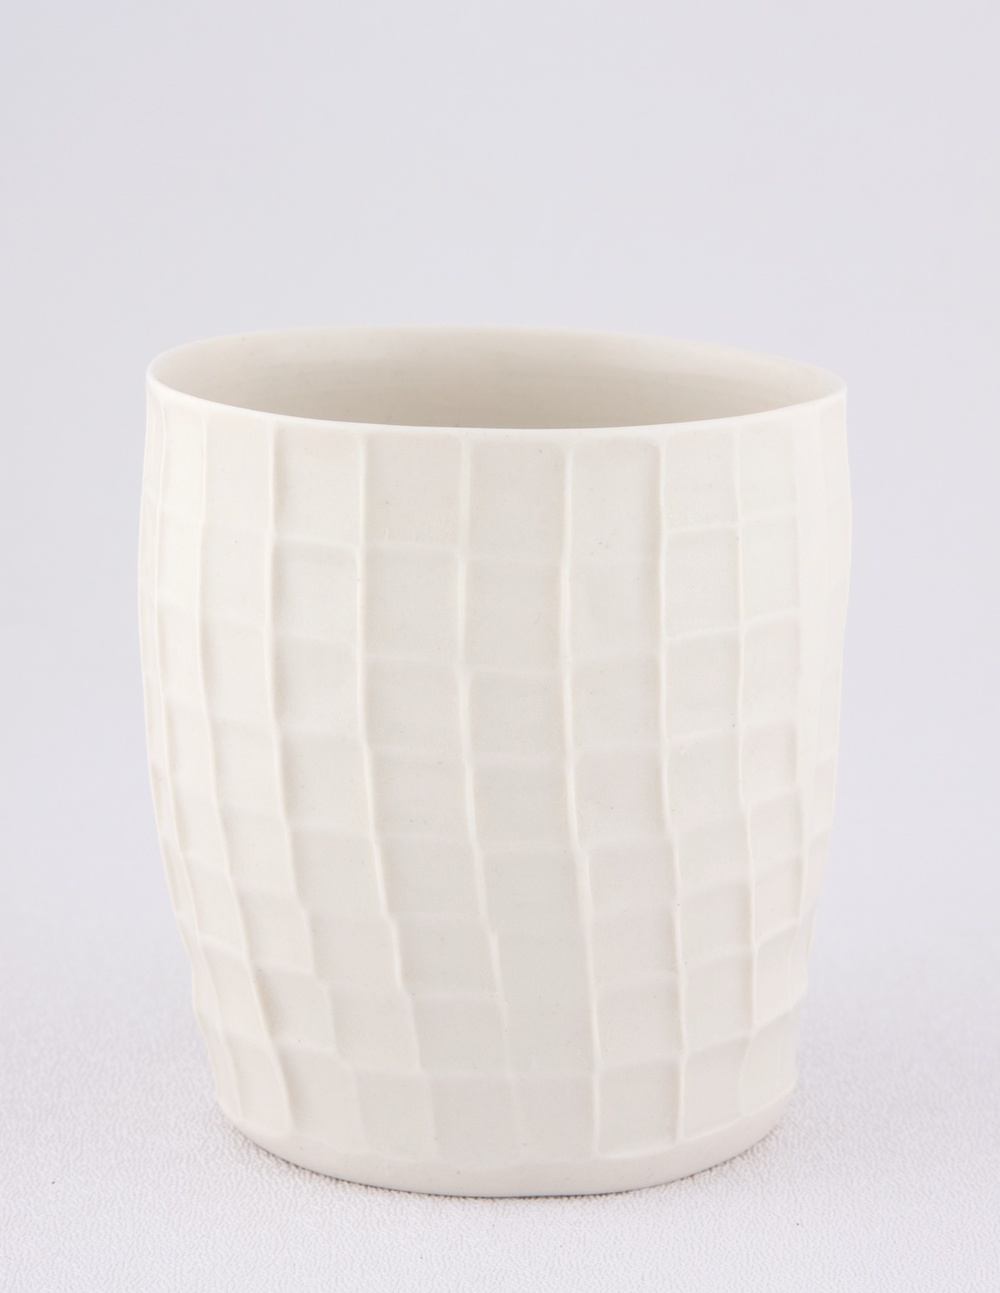 "Shio Kusaka Untitled (cup) 2009 Porcelain 3 1/2"" x 3"" SK018"